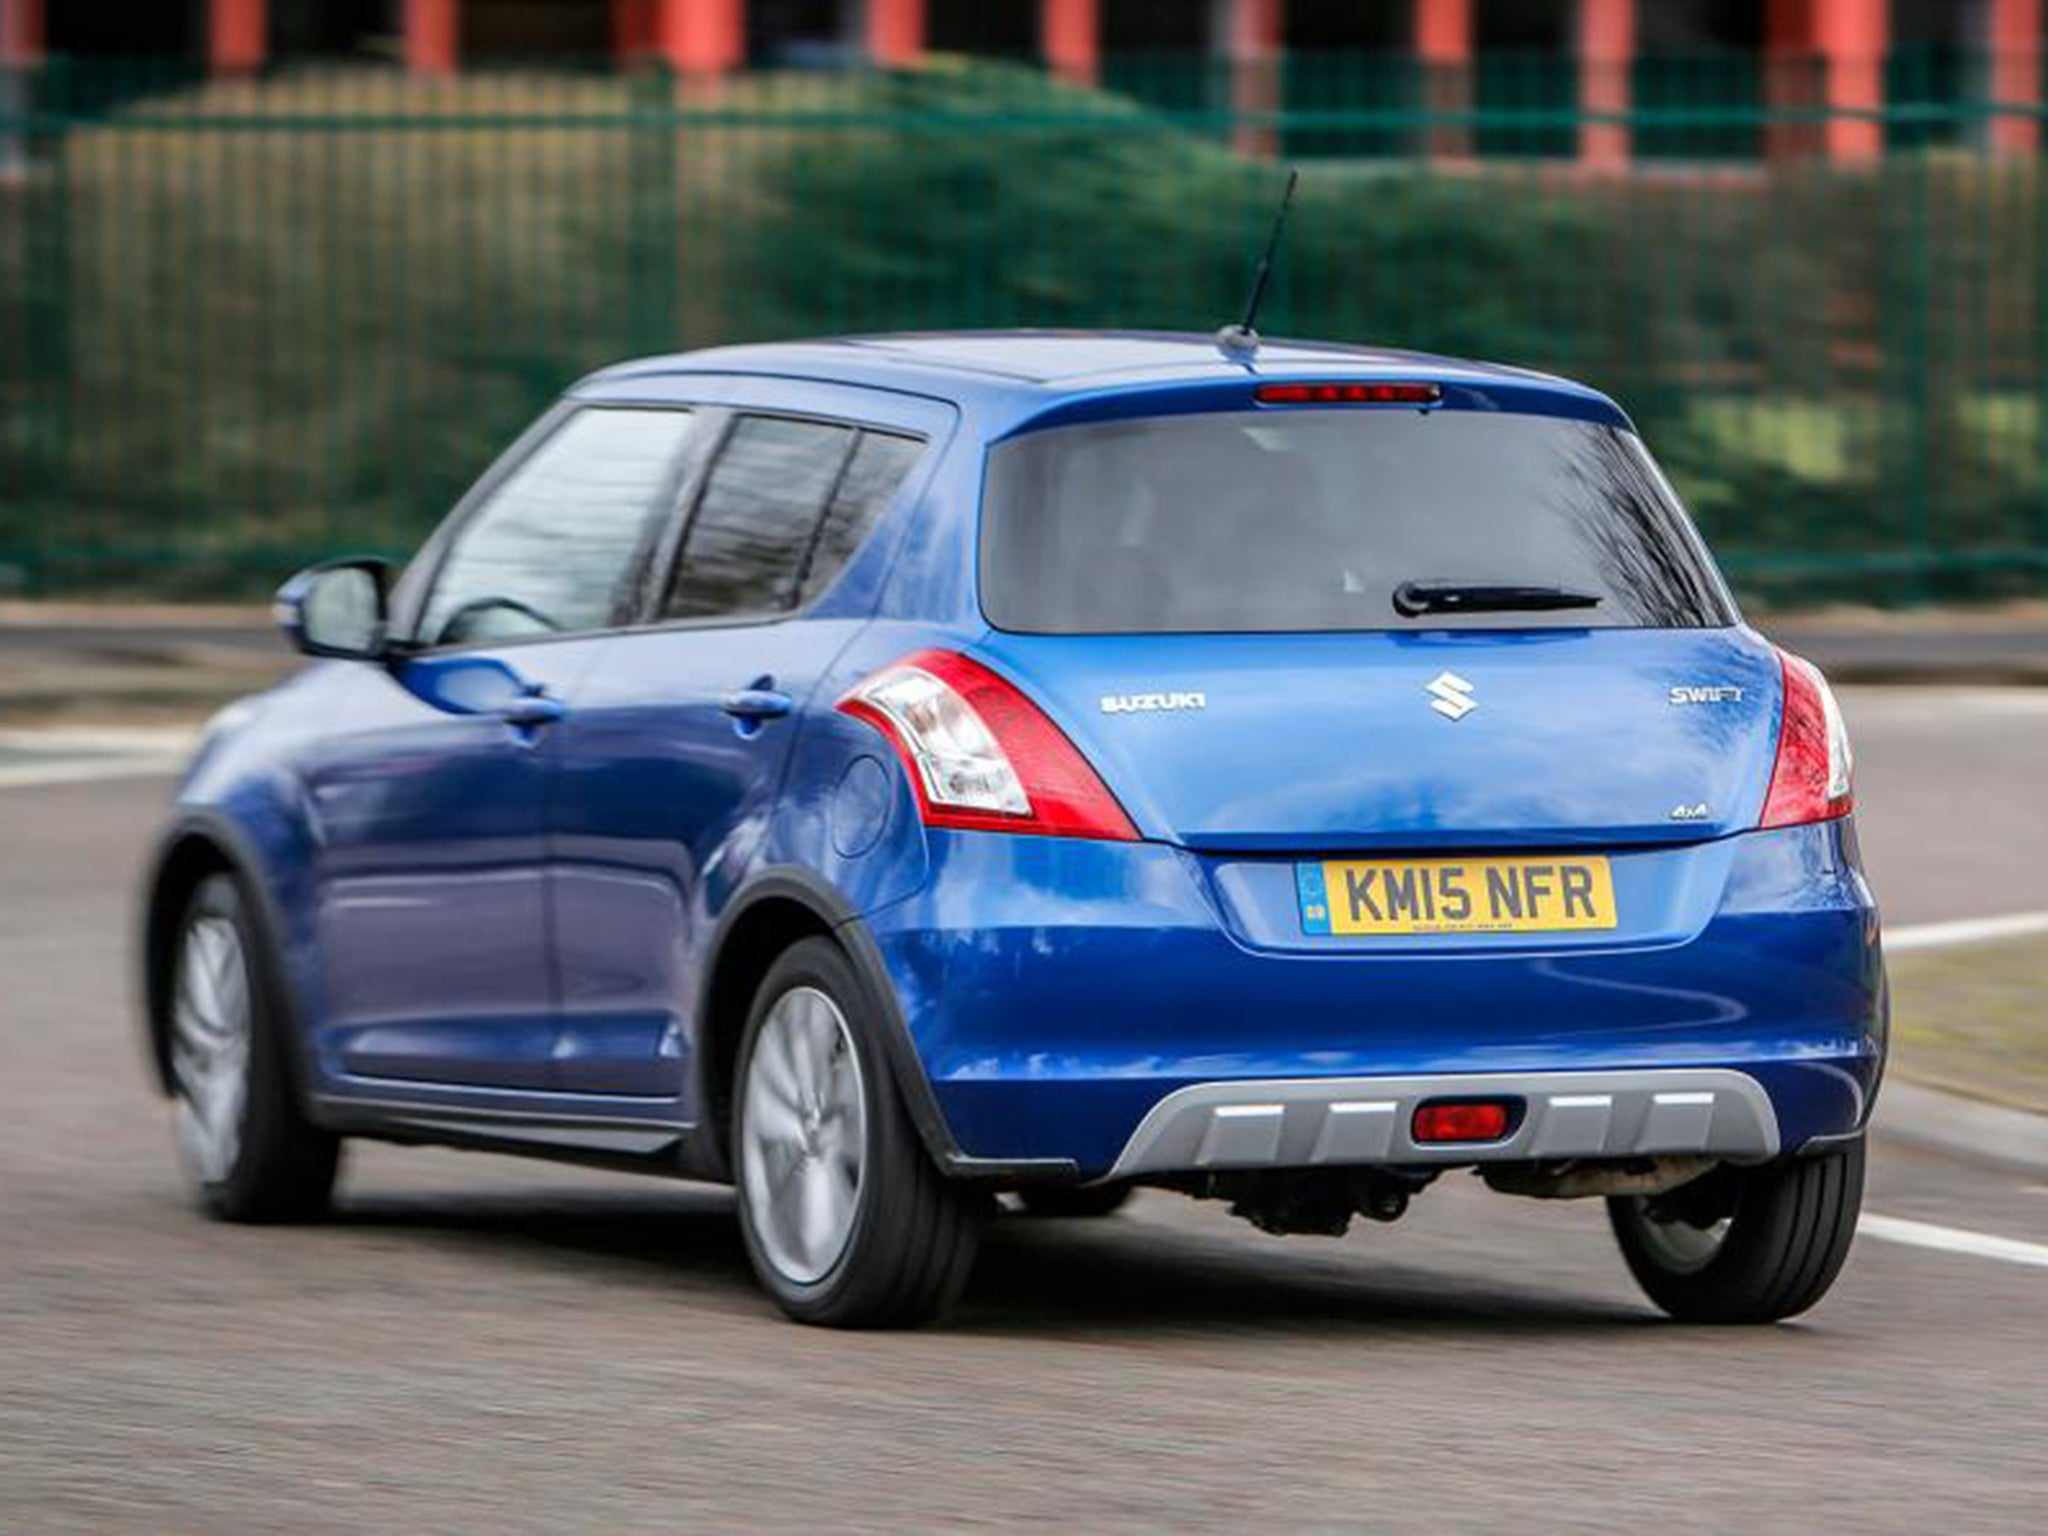 Suzuki Swift 1 2 SZ4 4x4 Dualjet, car review: All-wheel